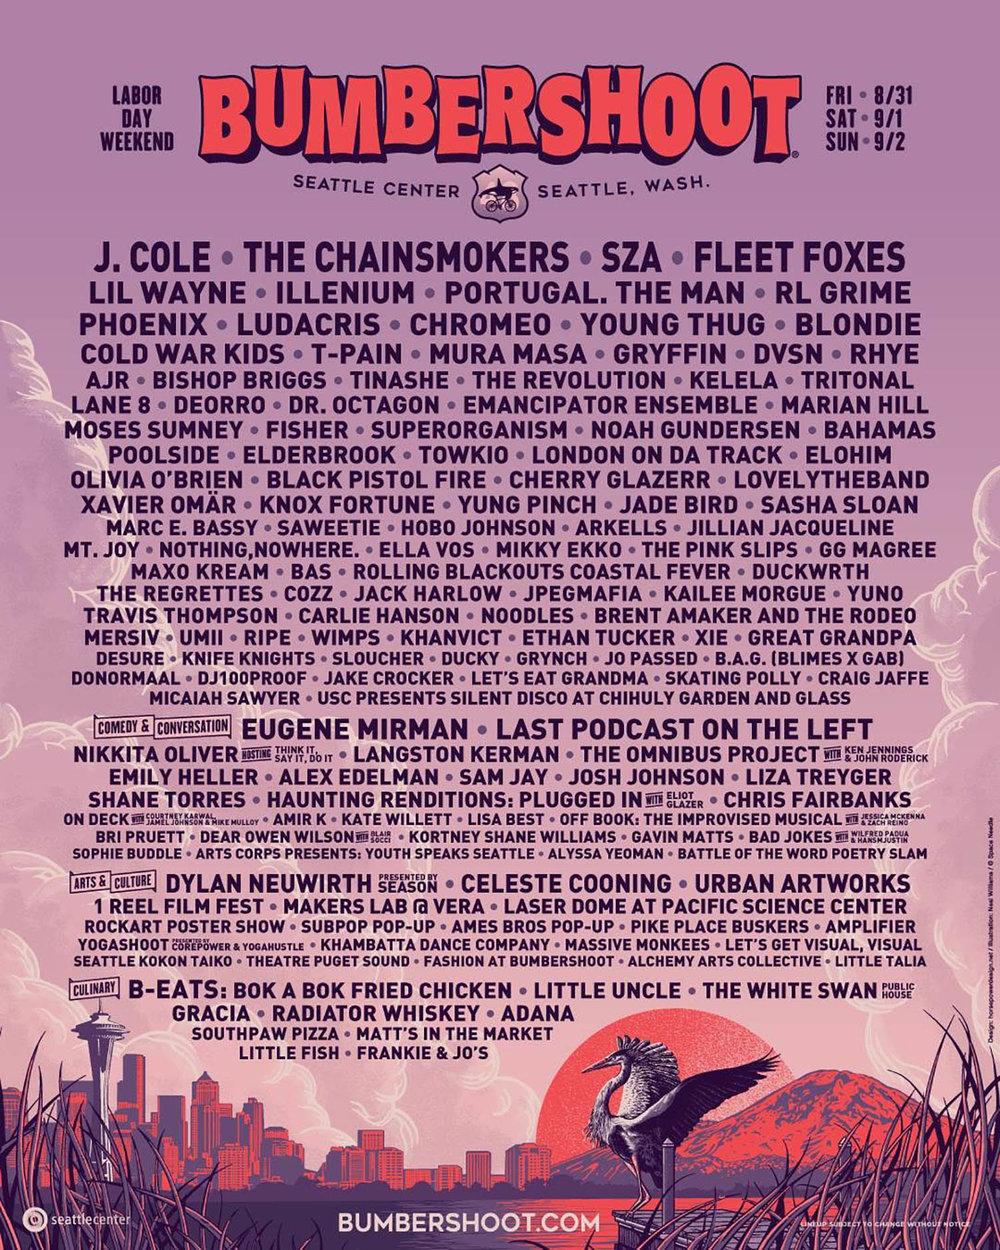 Official Bumbershoot 2018 Lineup Poster — image © 2018 Bumbershoot.